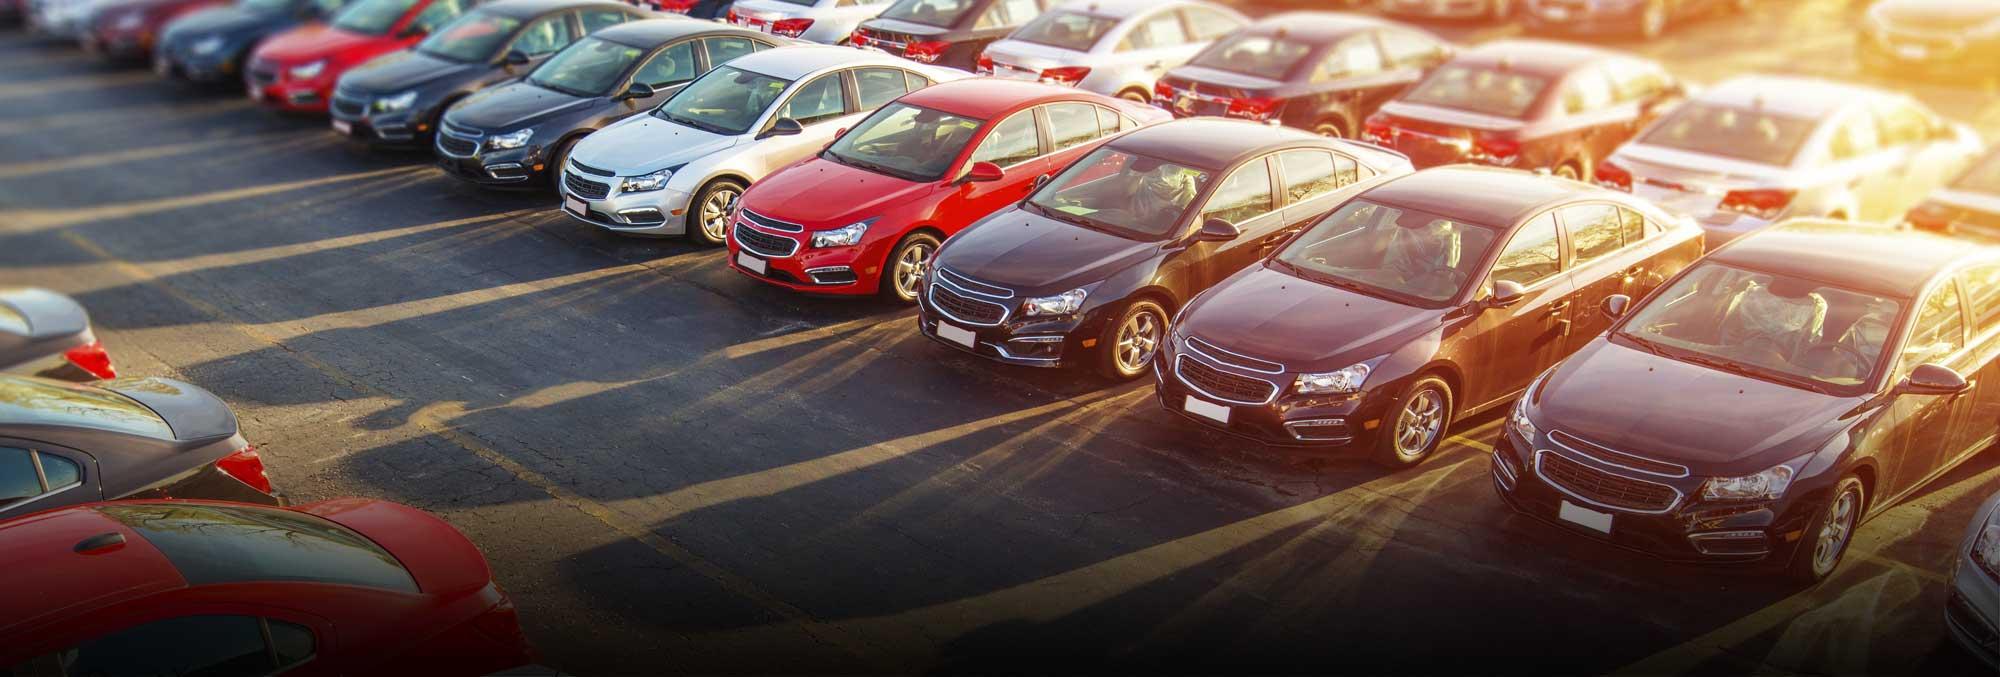 Melendez Auto Sales >> Twilight Auto Sales Car Dealer In San Antonio Tx